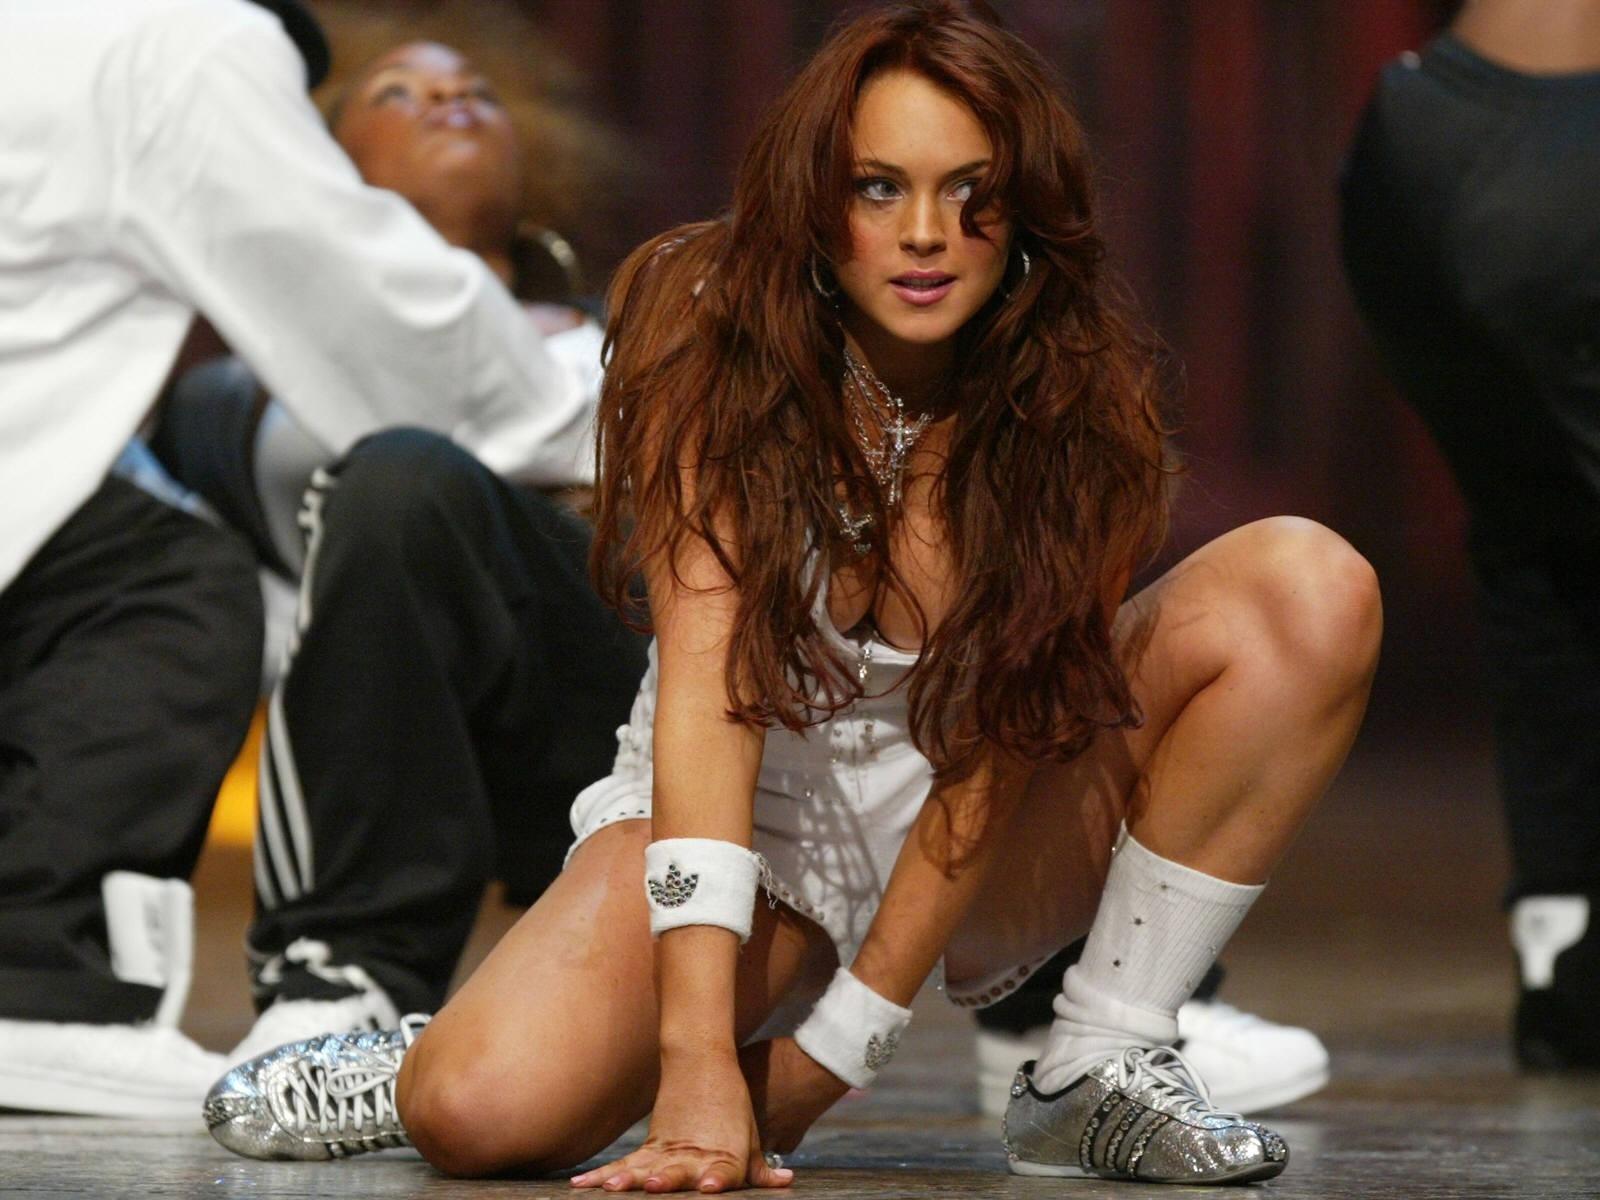 Wallpaper di Lindsay Lohan in versione ginnica